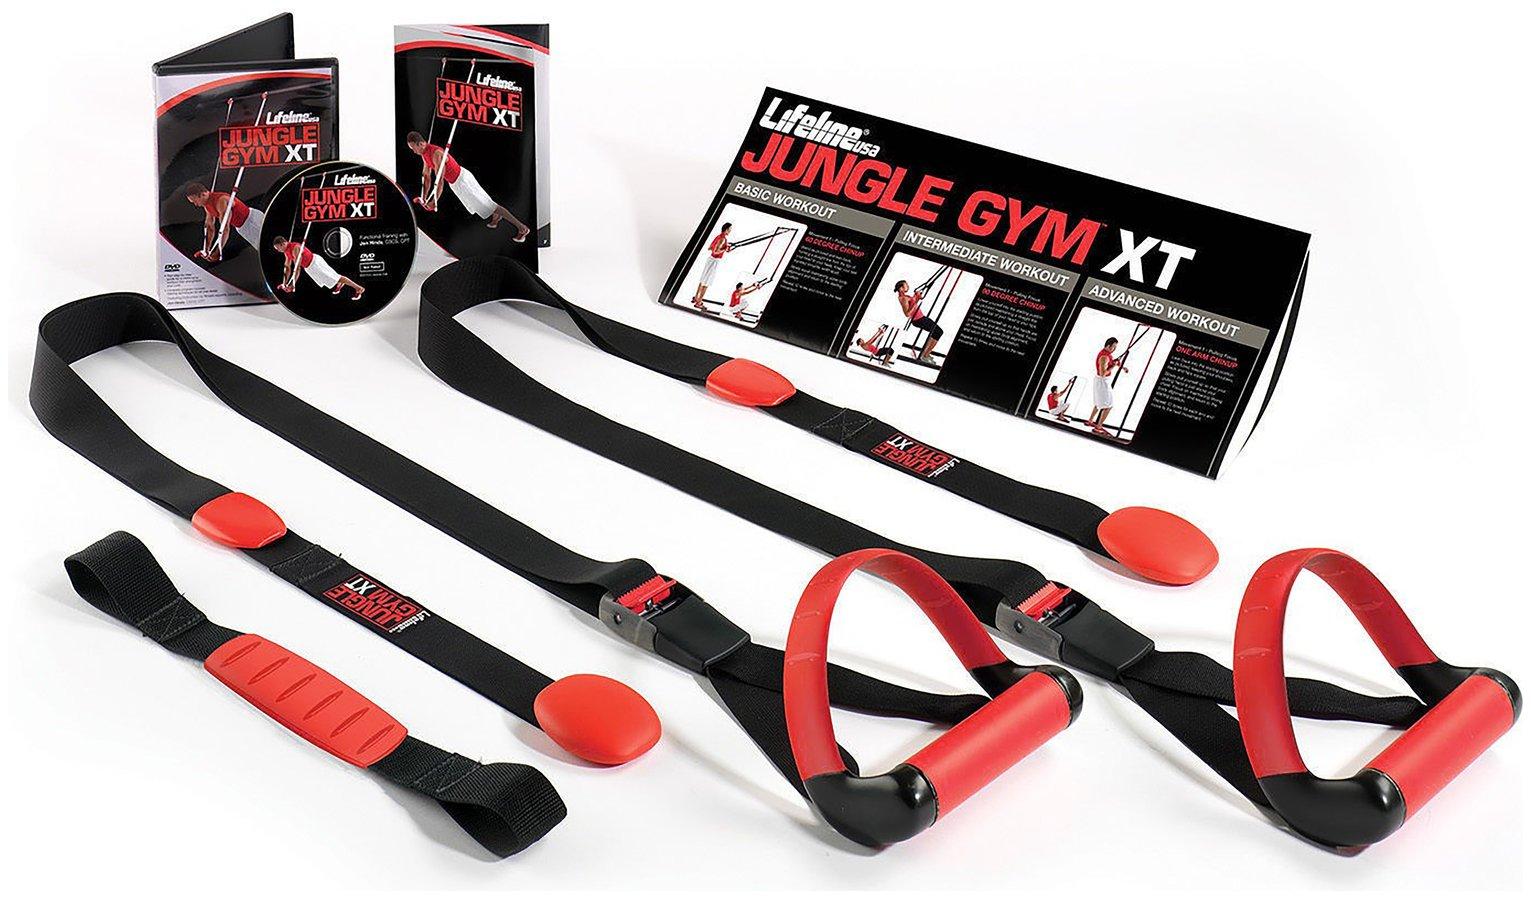 Image of Lifeline USA Jungle Gym XT